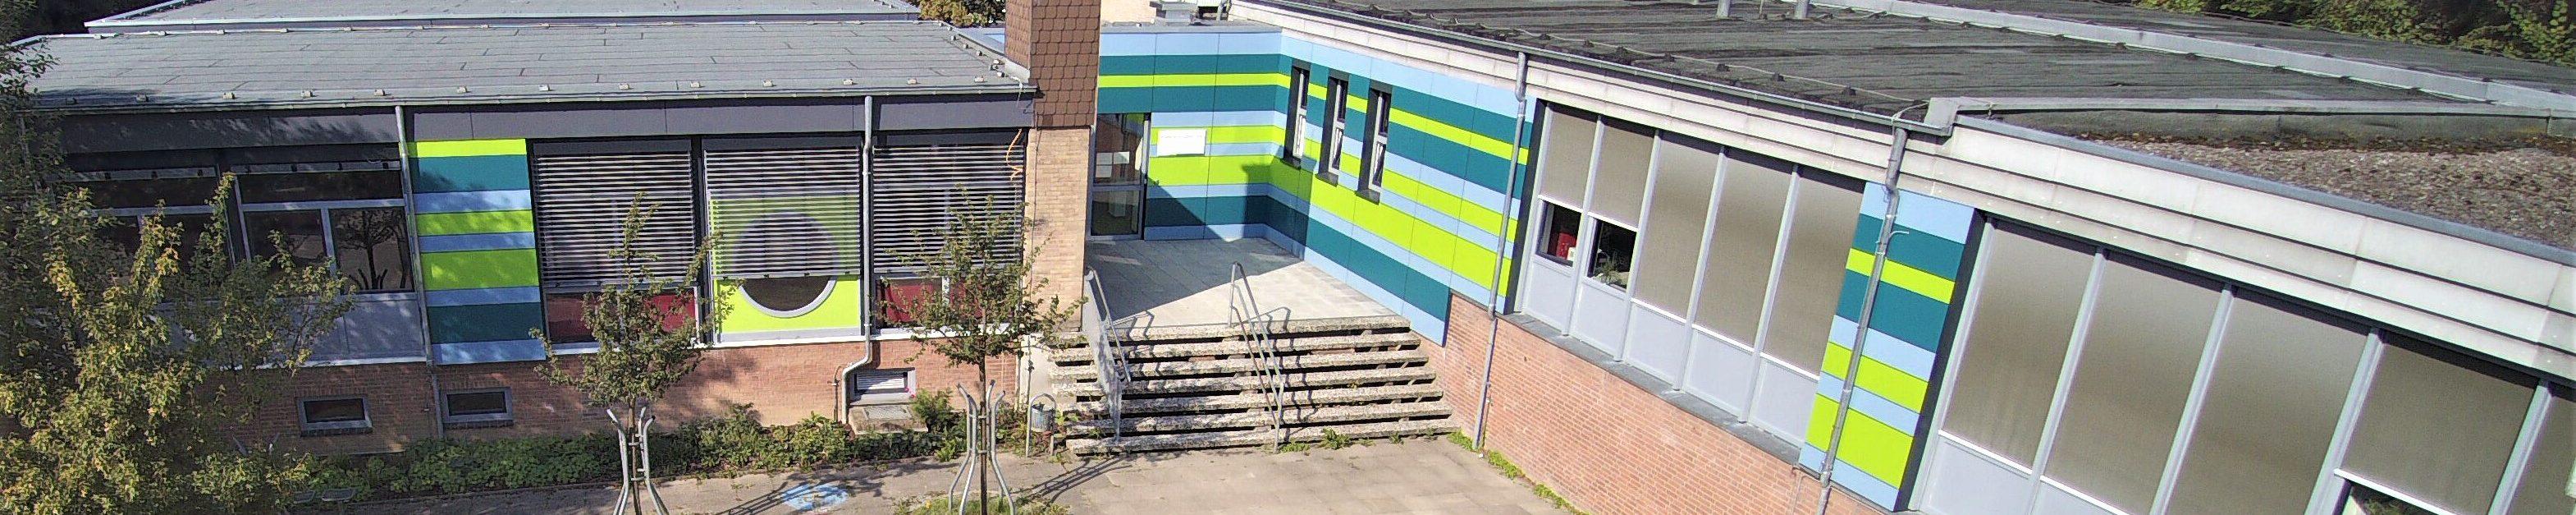 Integrationszentrum Blomberg